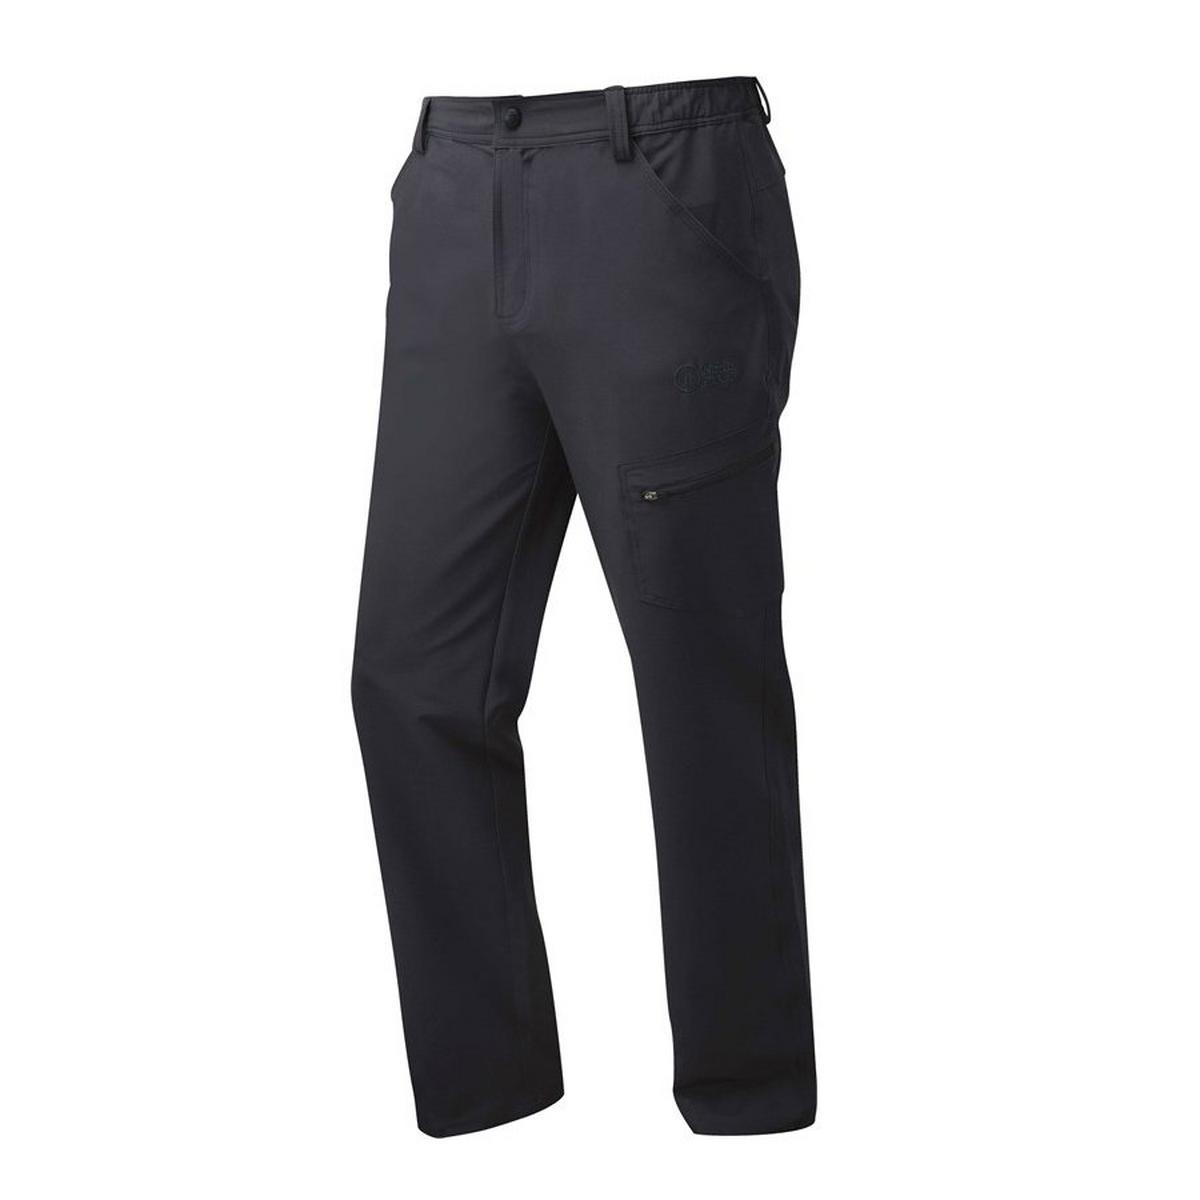 North Ridge Men's Yangon Trouser - Short